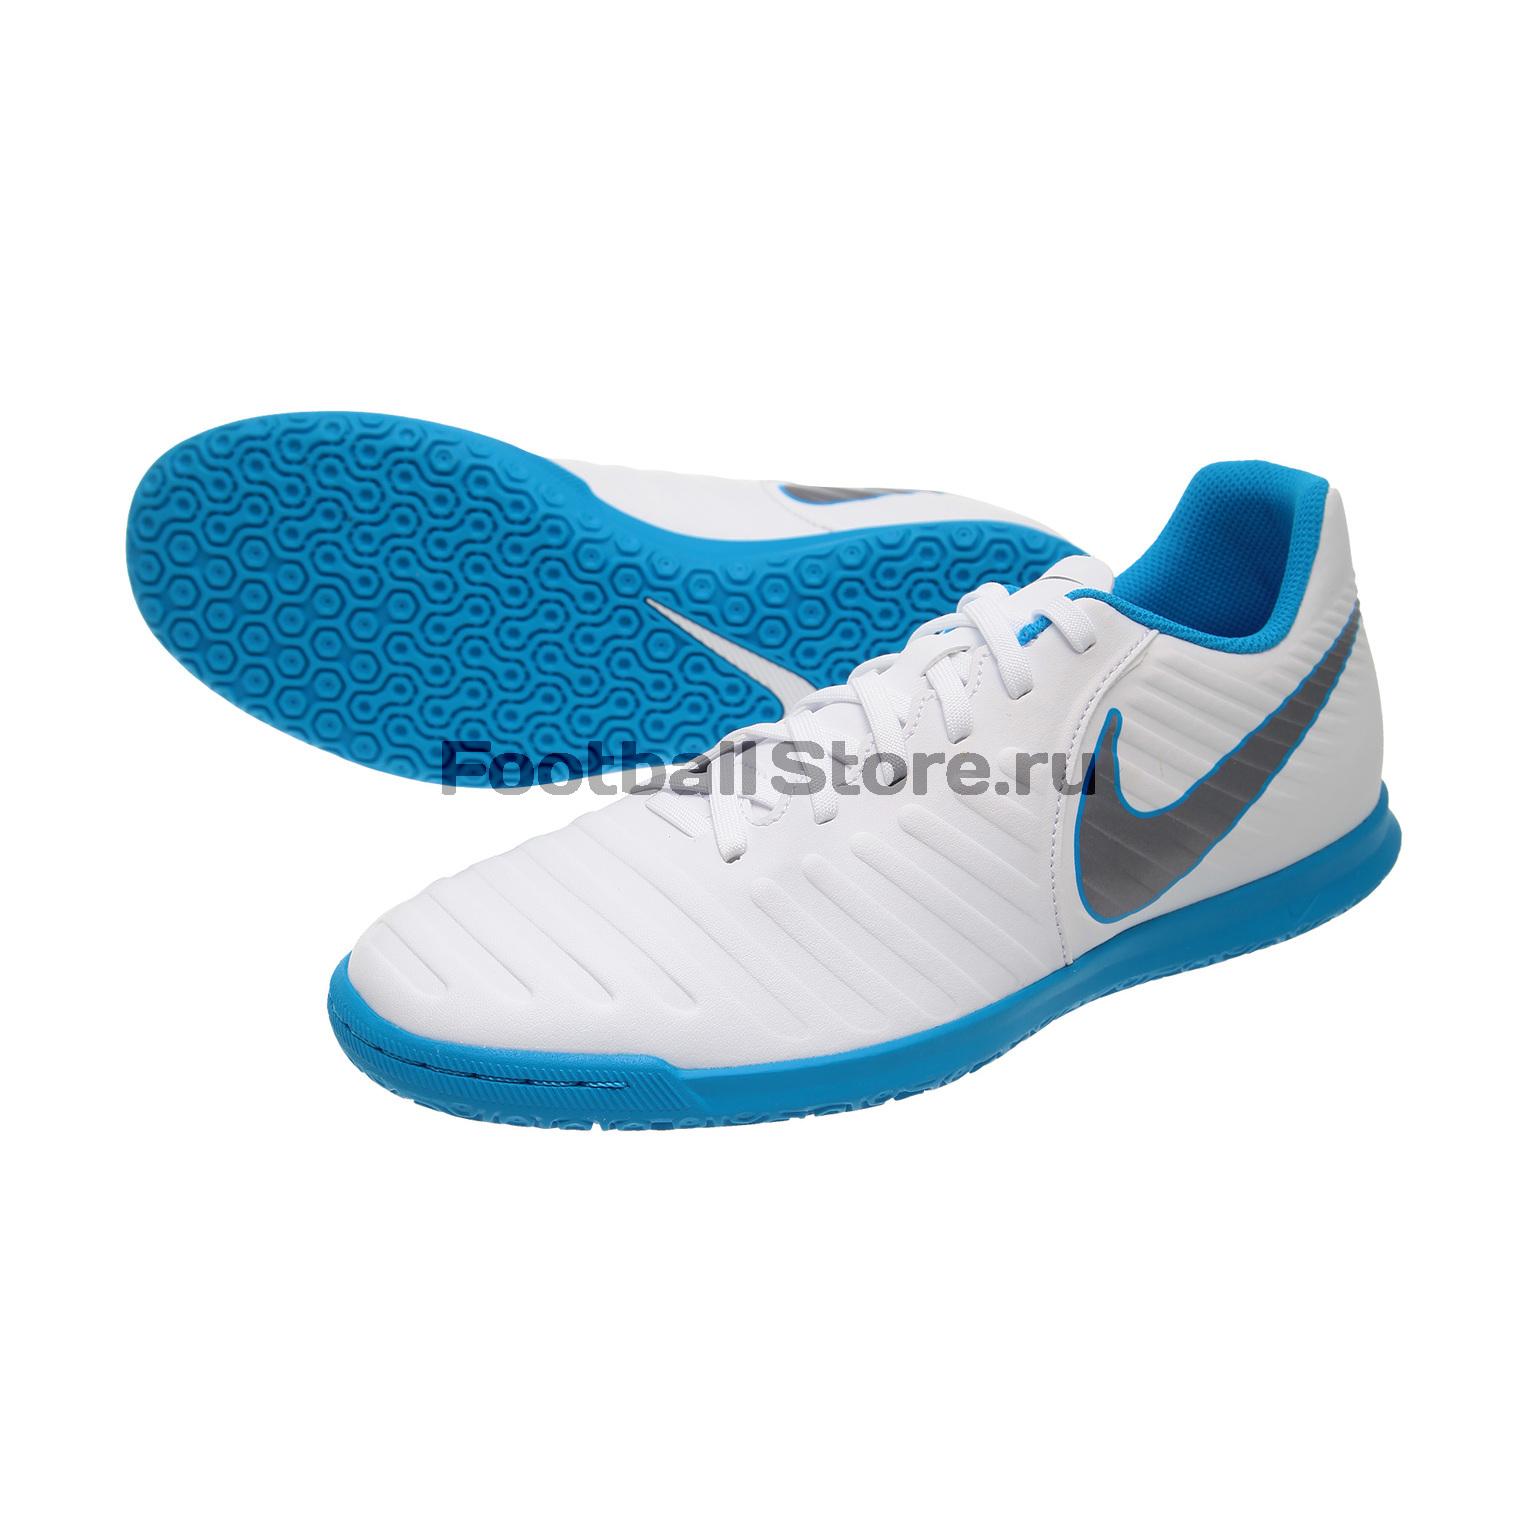 Обувь для зала Nike LegendX 7 Club IC AH7245-107 шиповки nike lunar legendx 7 pro tf ah7249 080